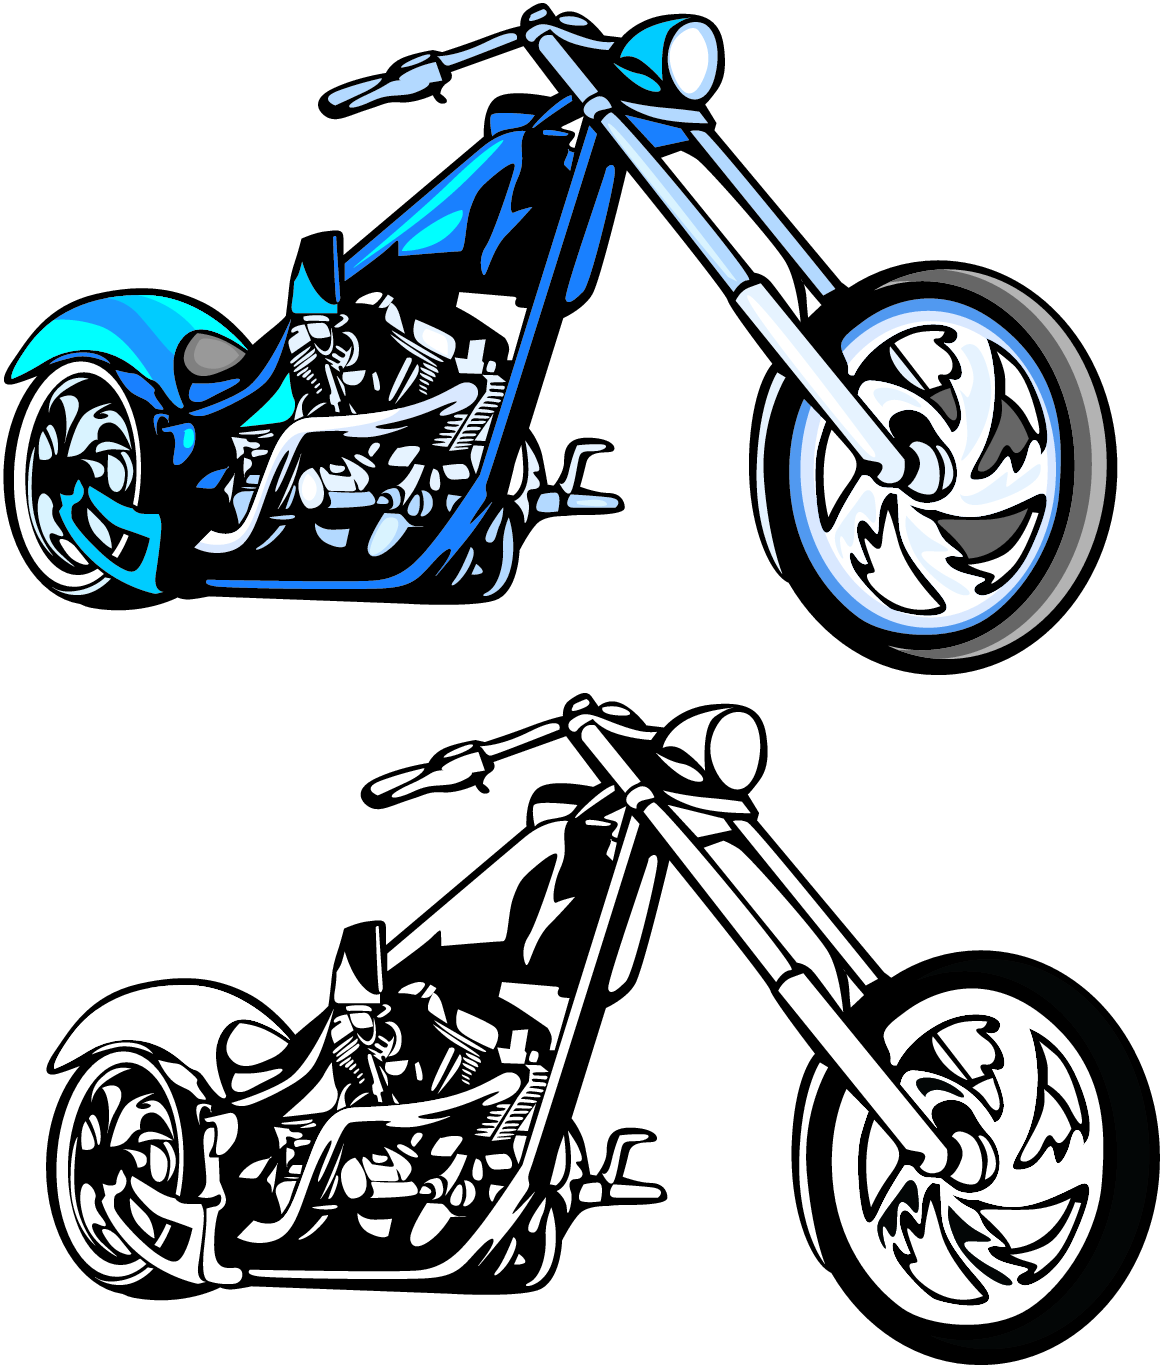 Harley Davidson Clipart - ClipArt Best